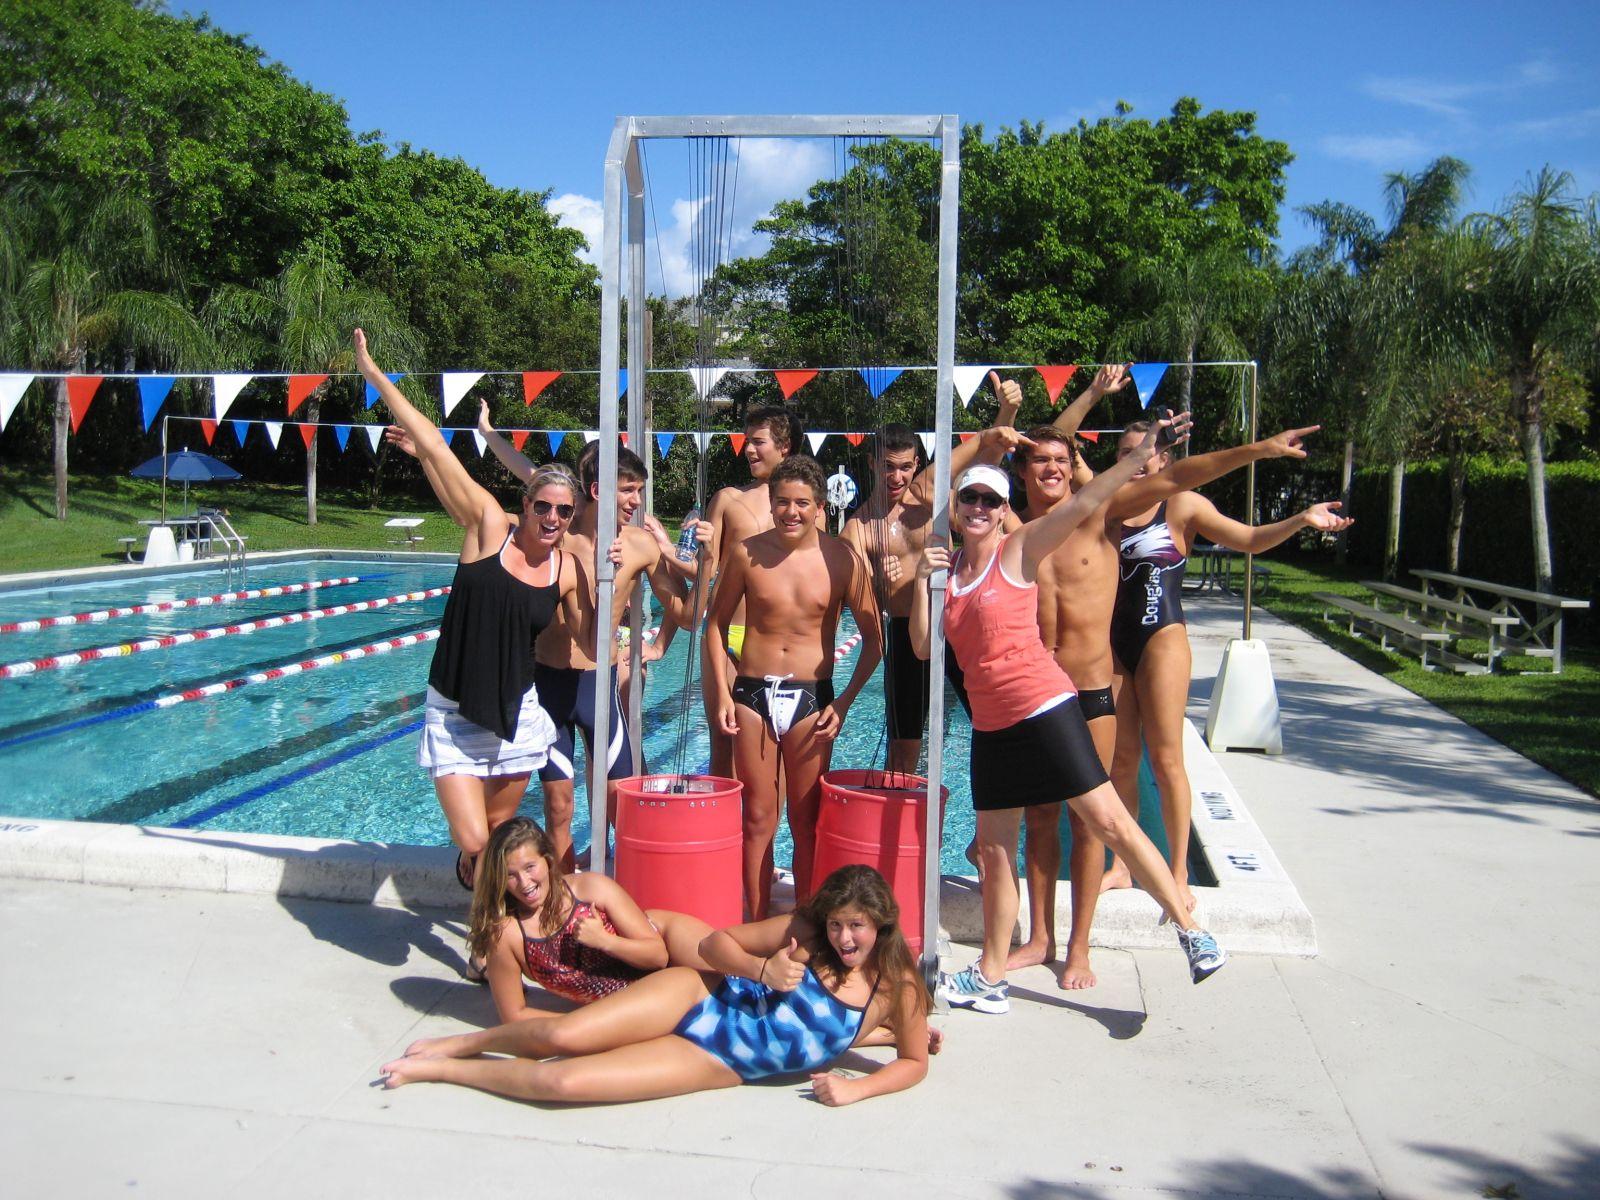 Sprint swimming program